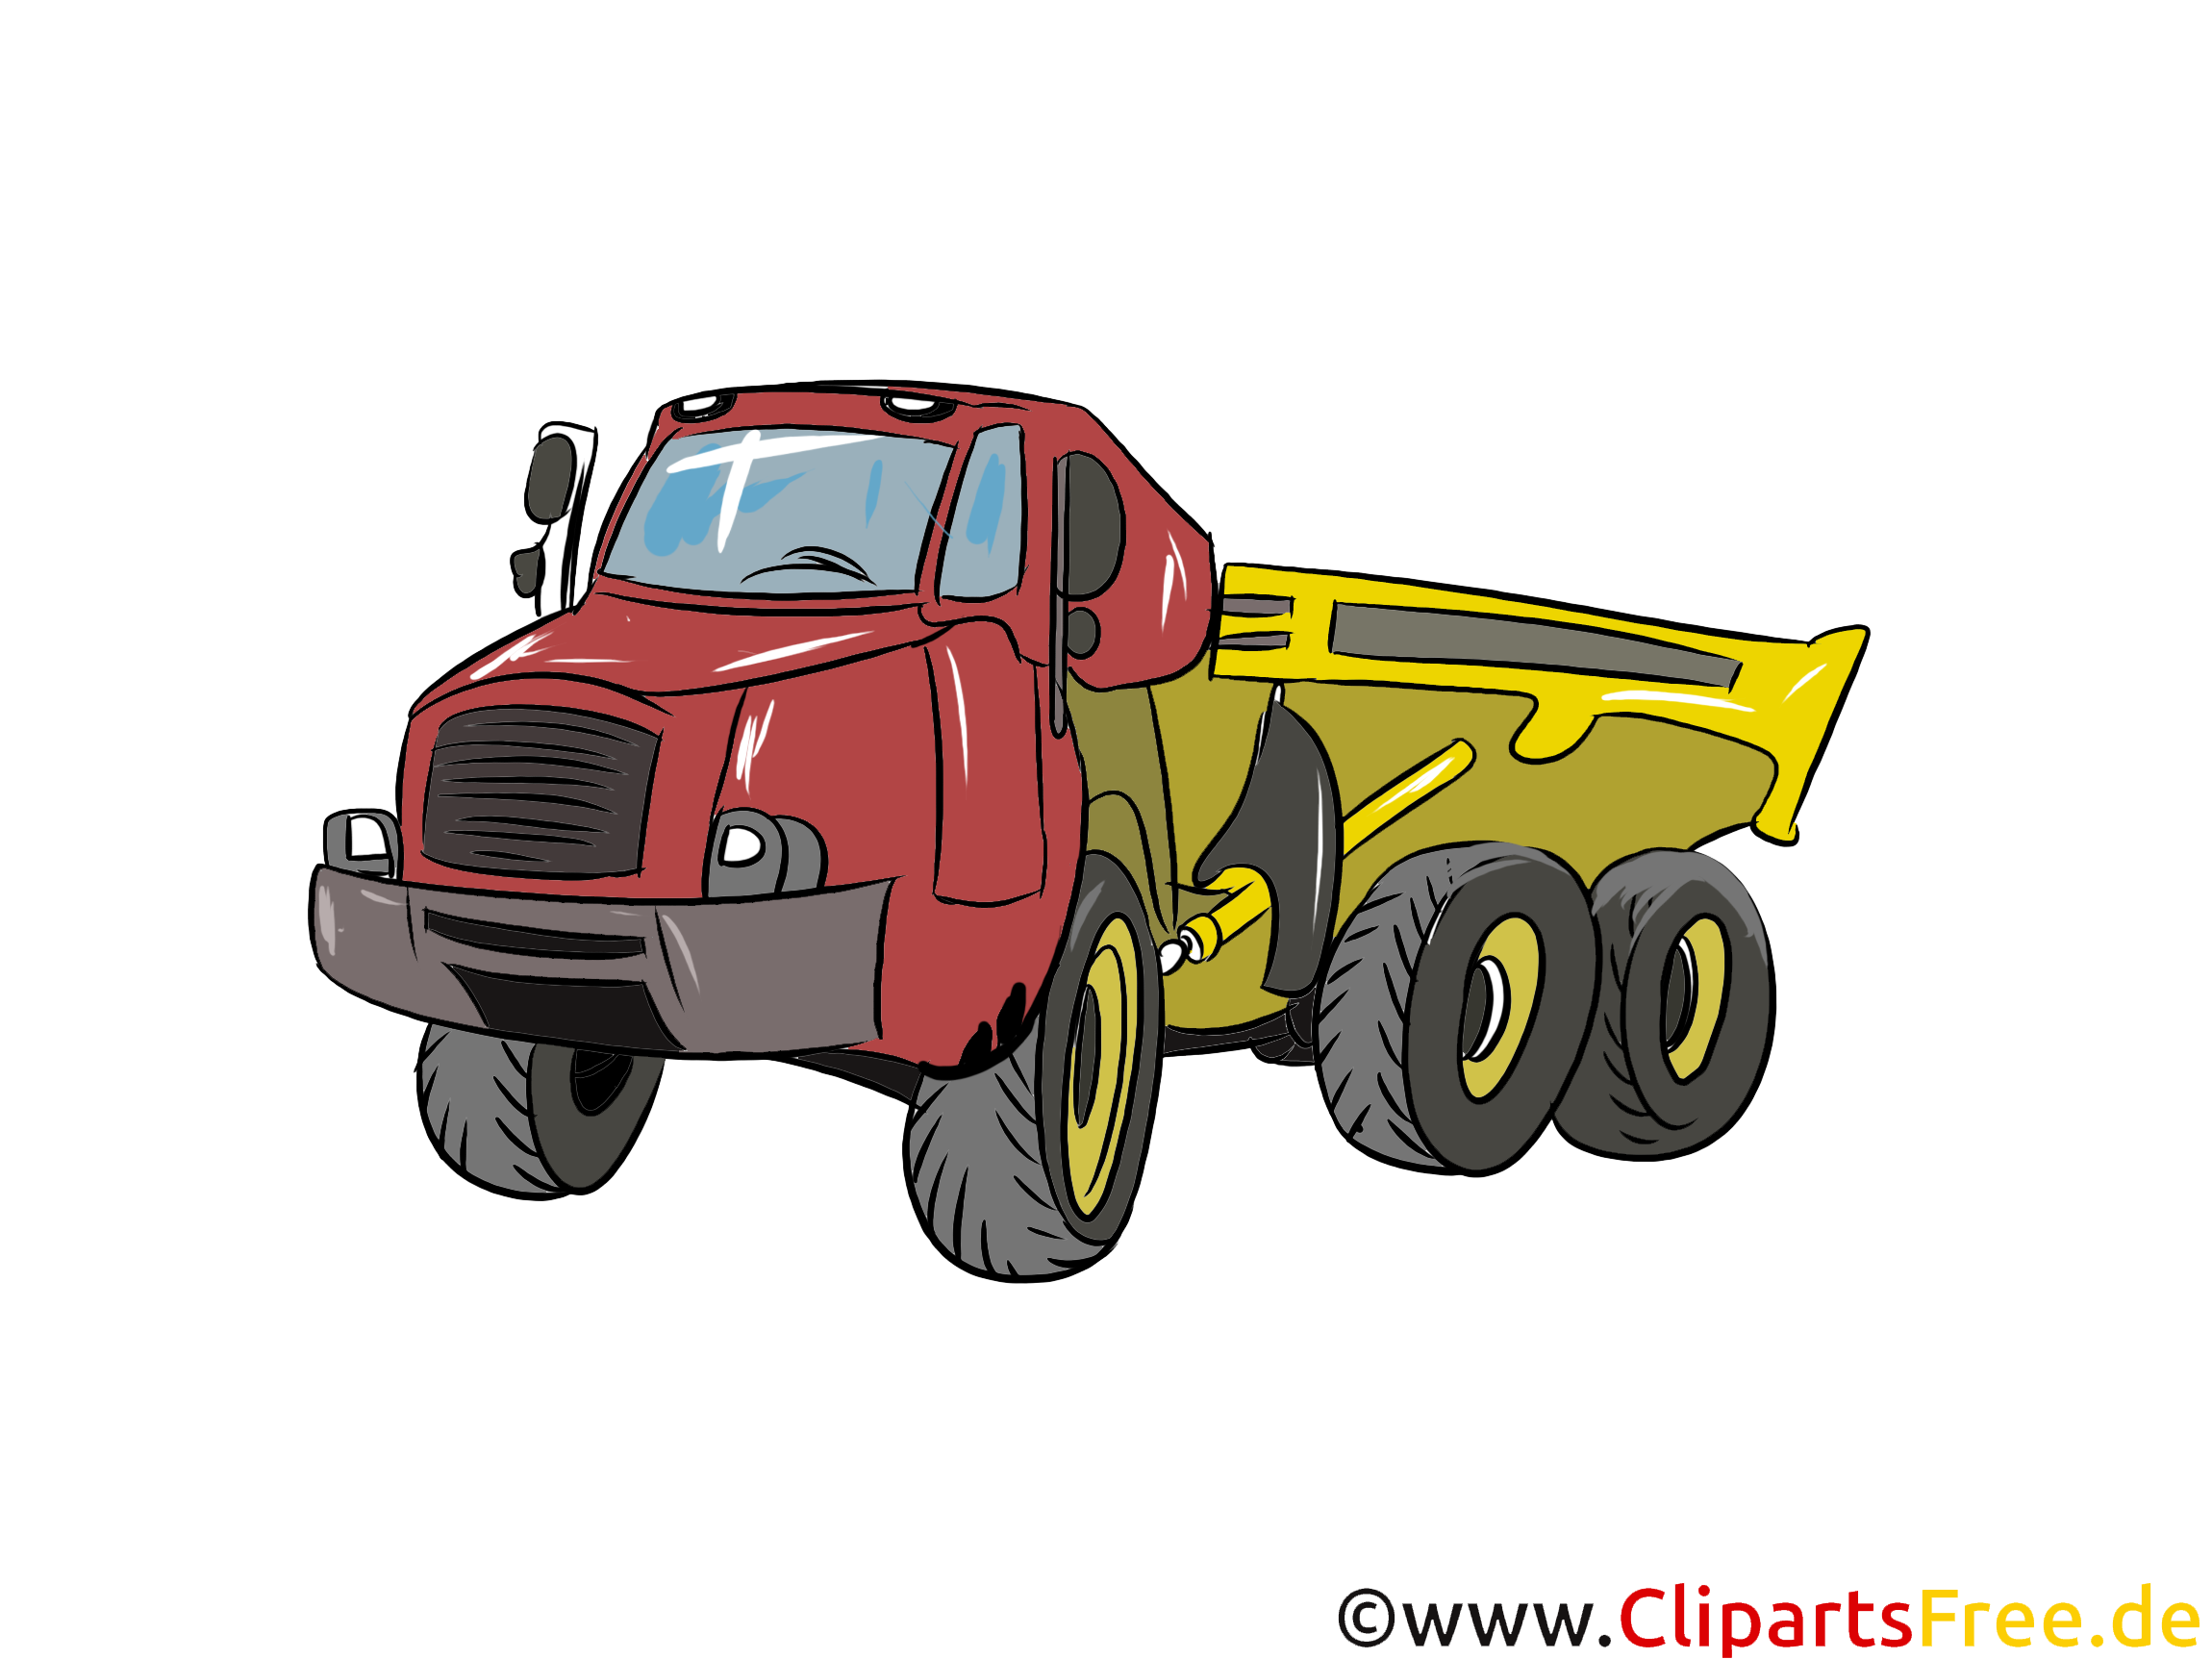 Dumper LKW Illustration, Bild, Clipart Autos